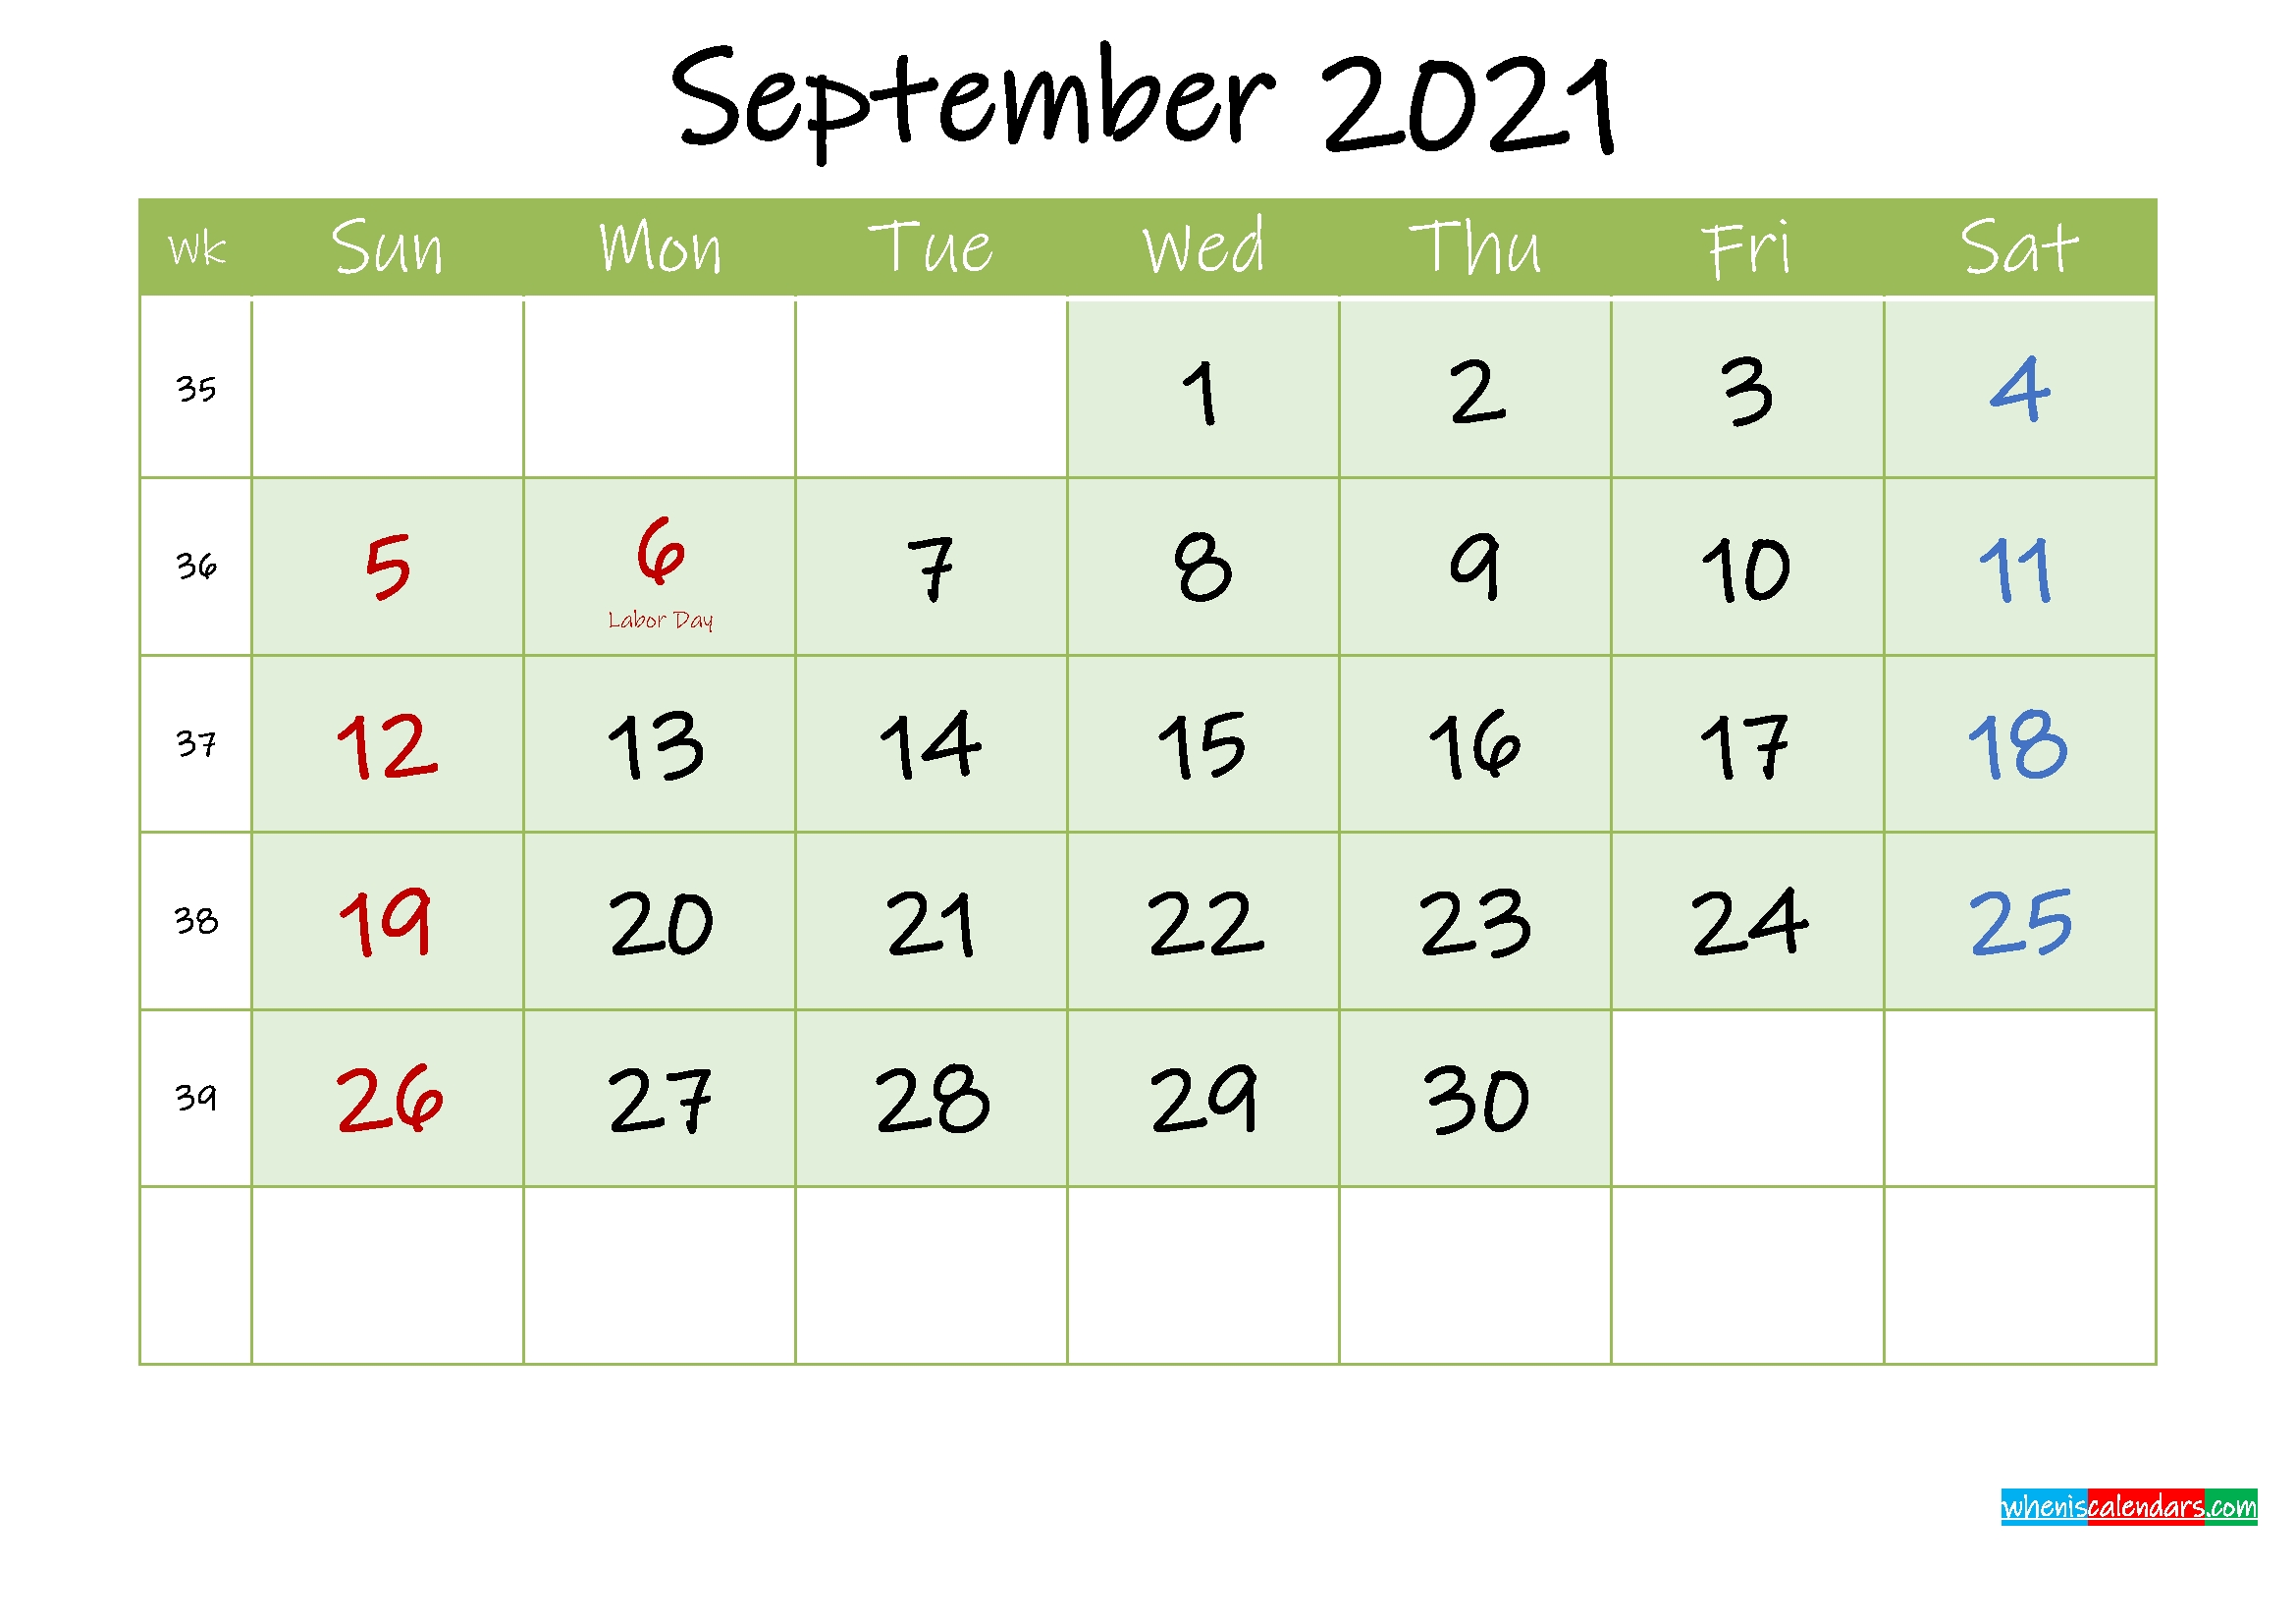 September 2021 Free Printable Calendar - Template Ink21M129 2021 Calendar September Month